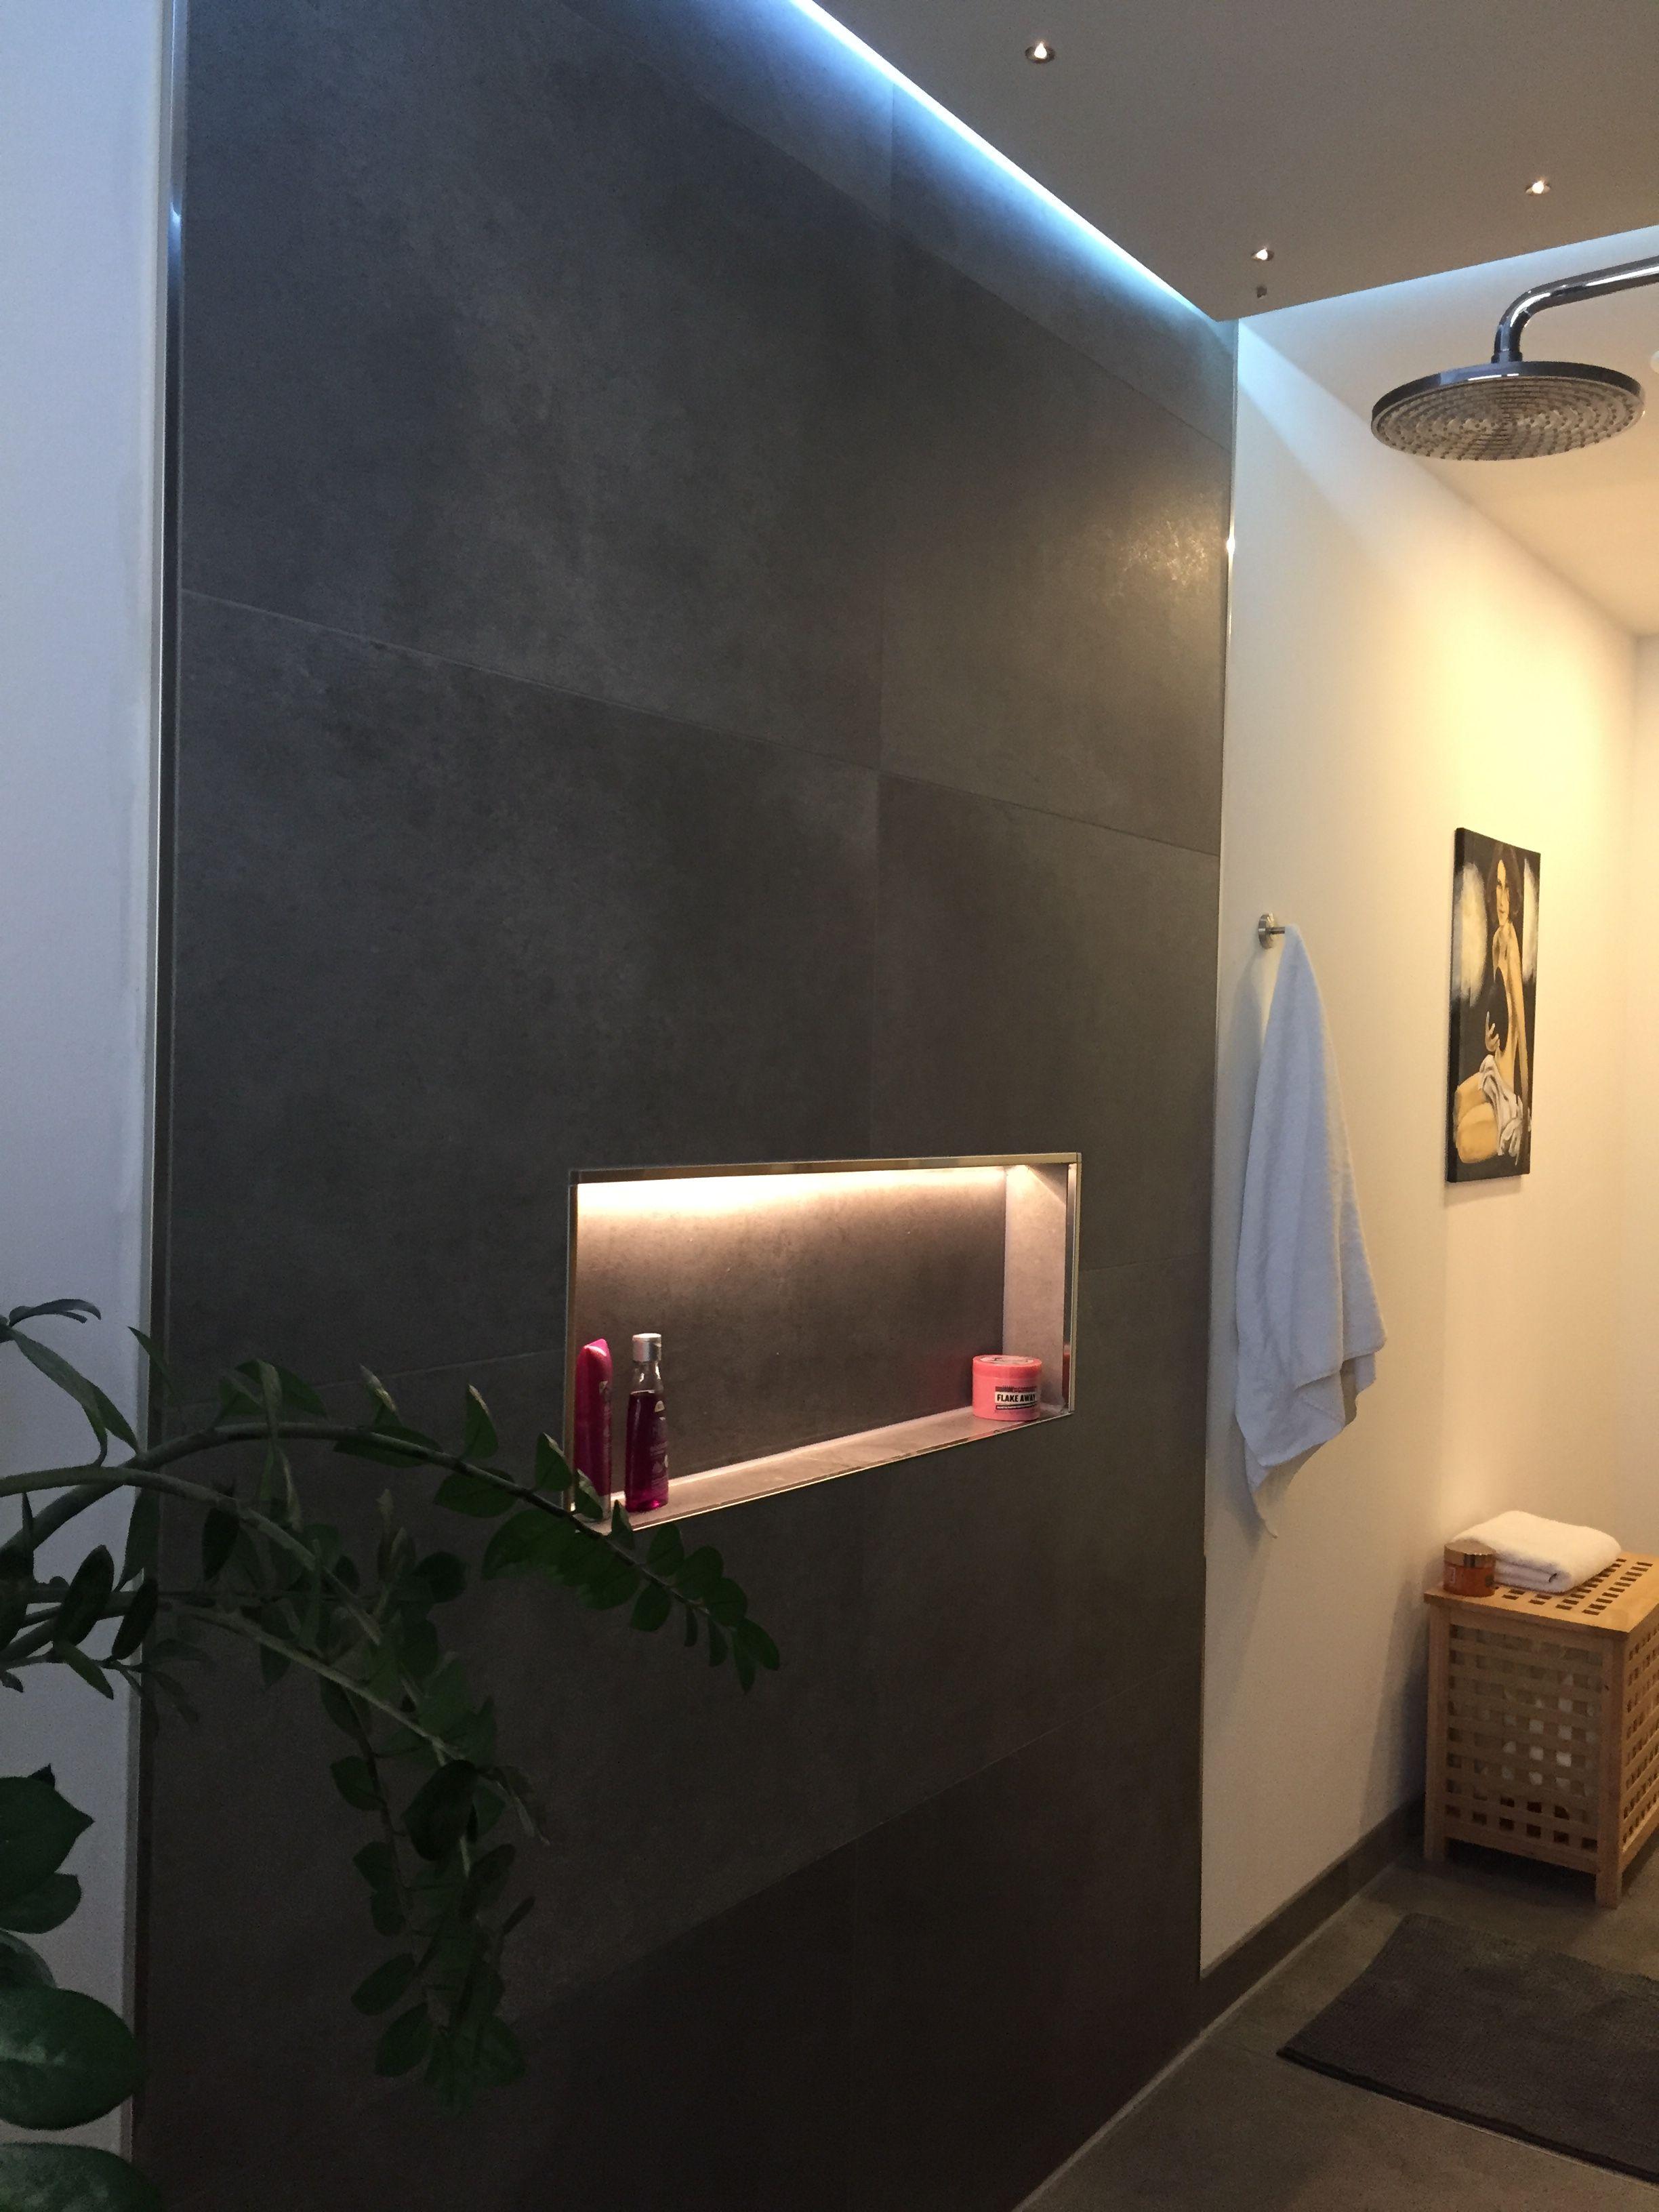 Bathroom Shower Light Indirect Indirekte Beleuchtung Abkastung Led Badezimmer Badezimmer Licht Dusche Beleuchtung Indirekte Beleuchtung